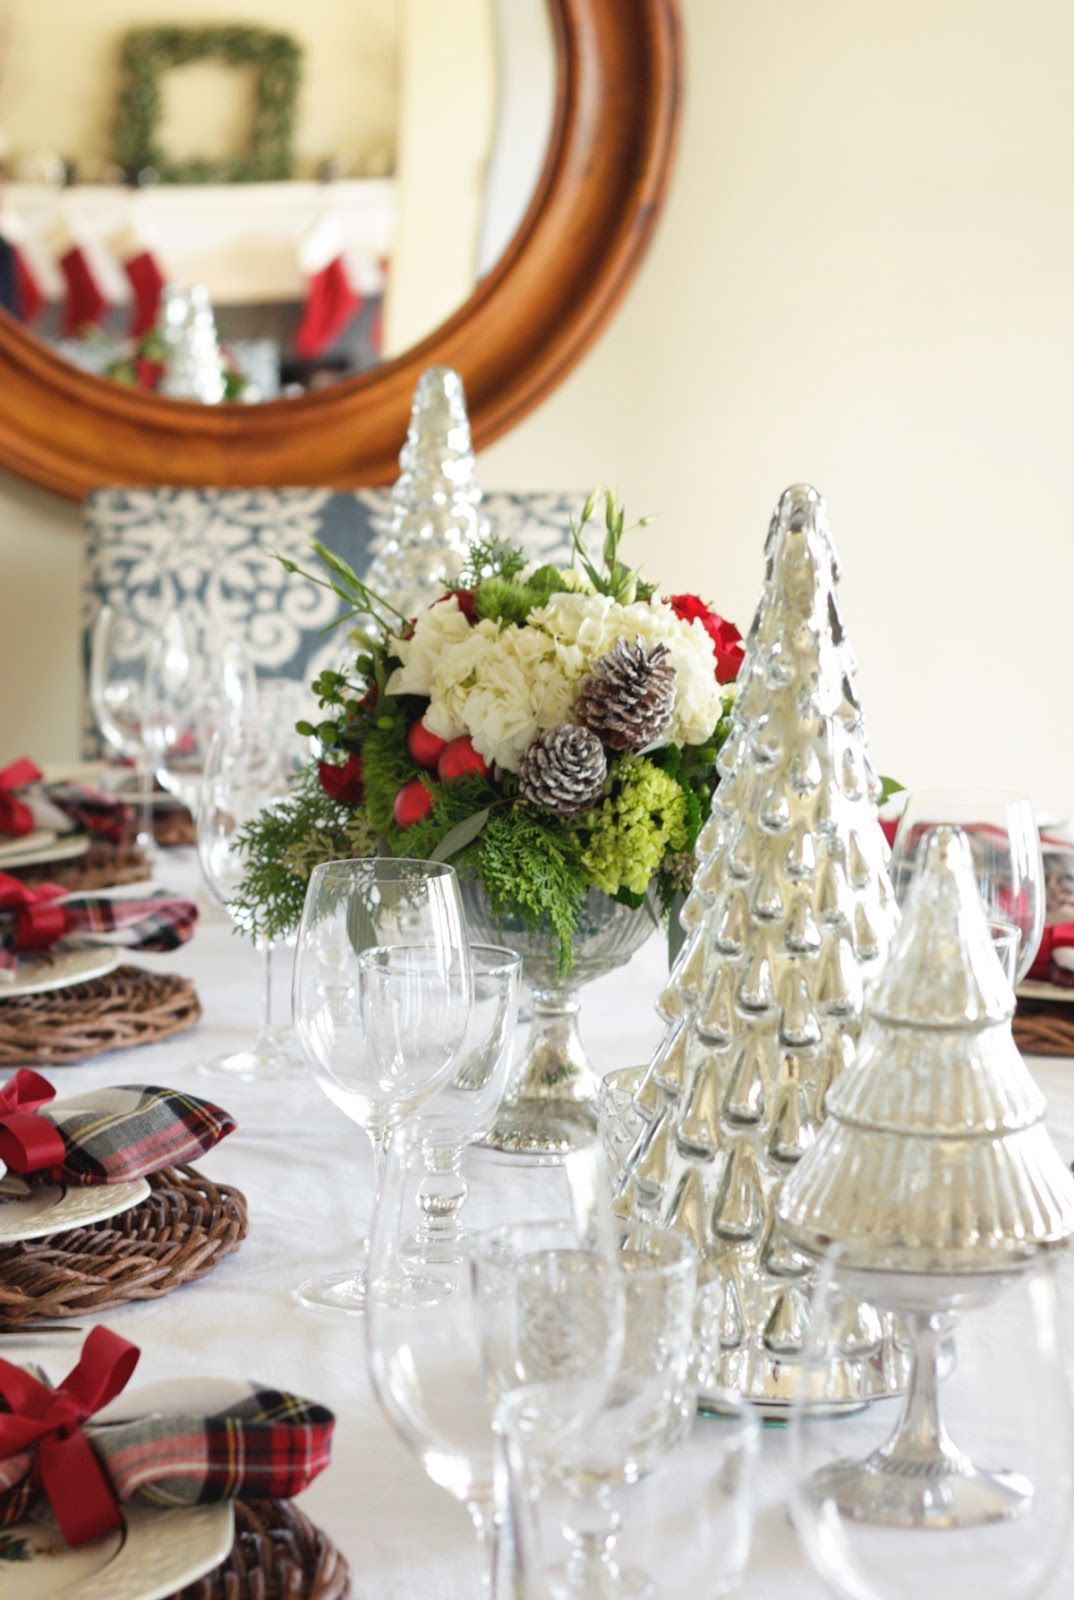 In Good Taste: Christmas Tablescape | C H R I S T M A S | Pinterest ...